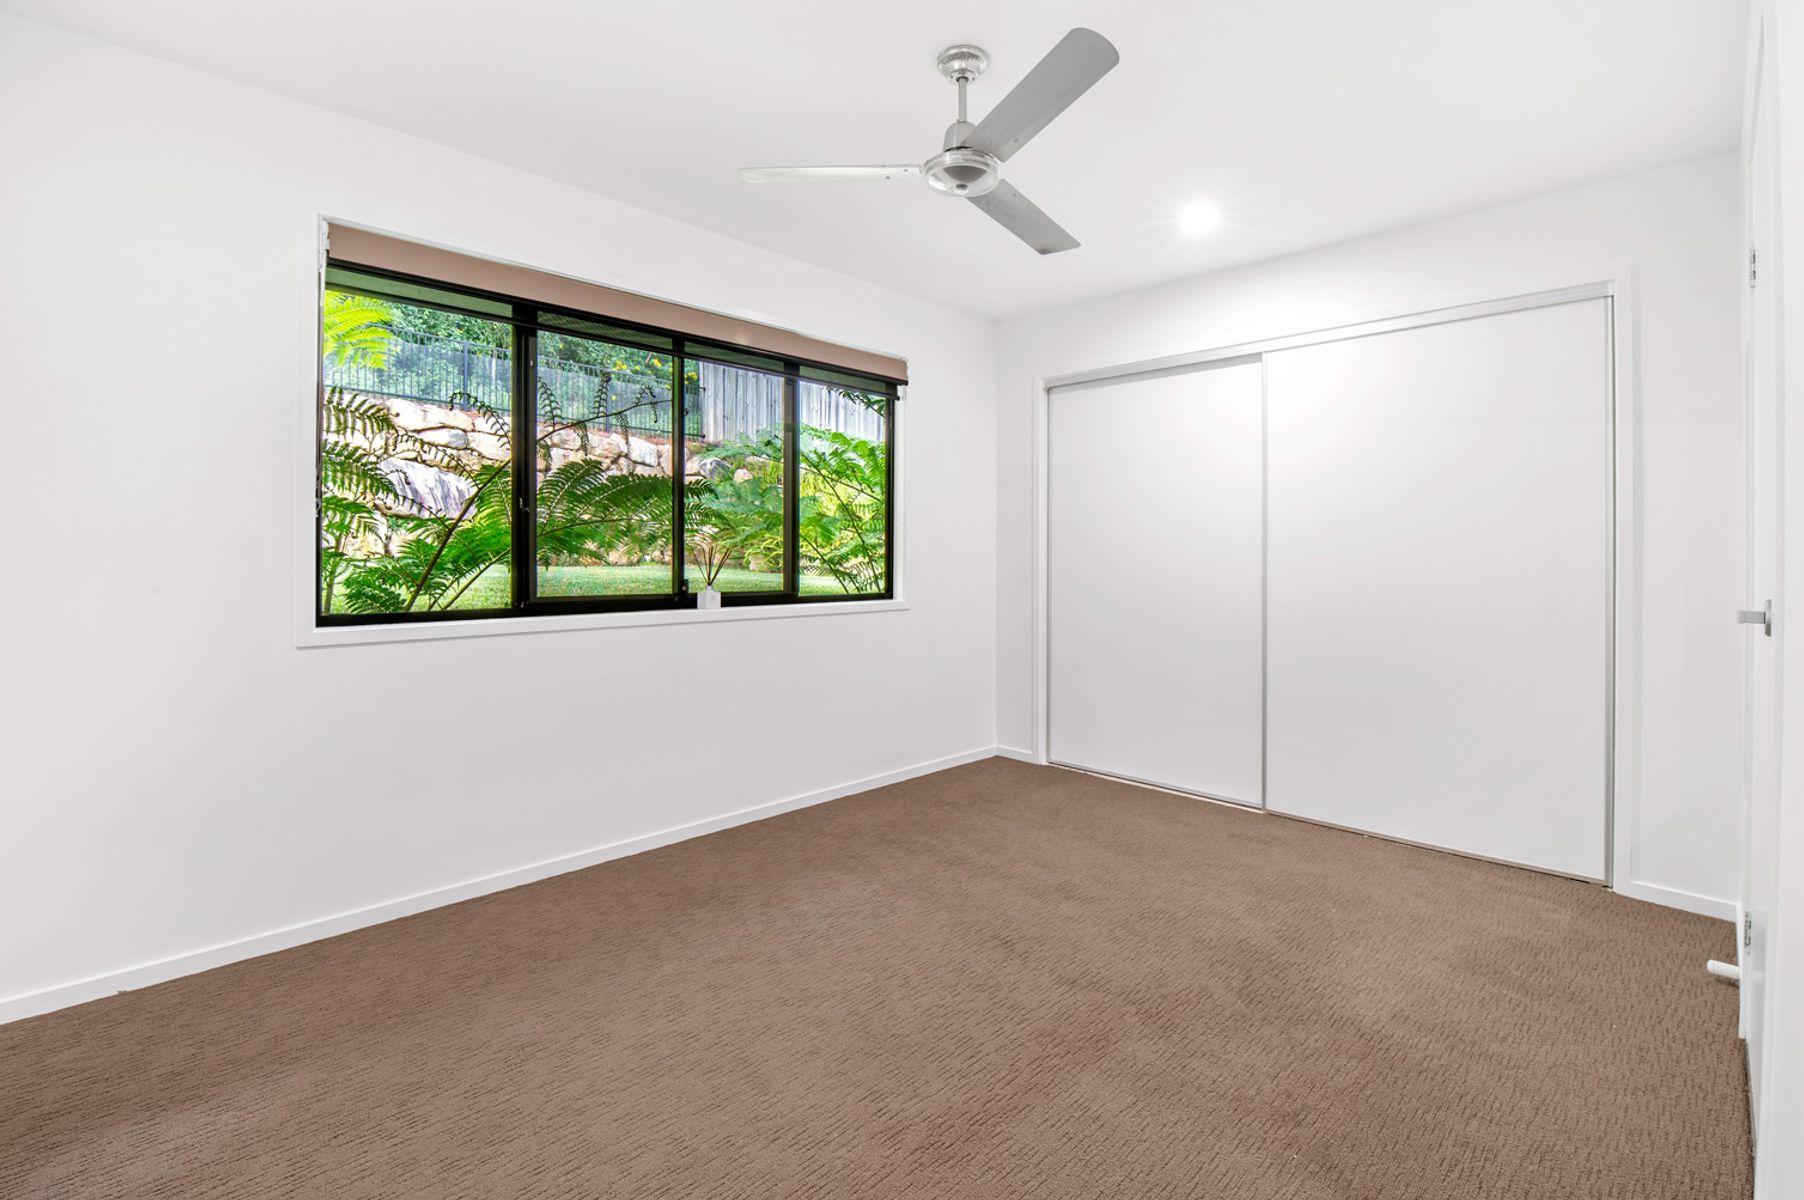 58 Wyangan Valley Way, Mudgeeraba, QLD 4213